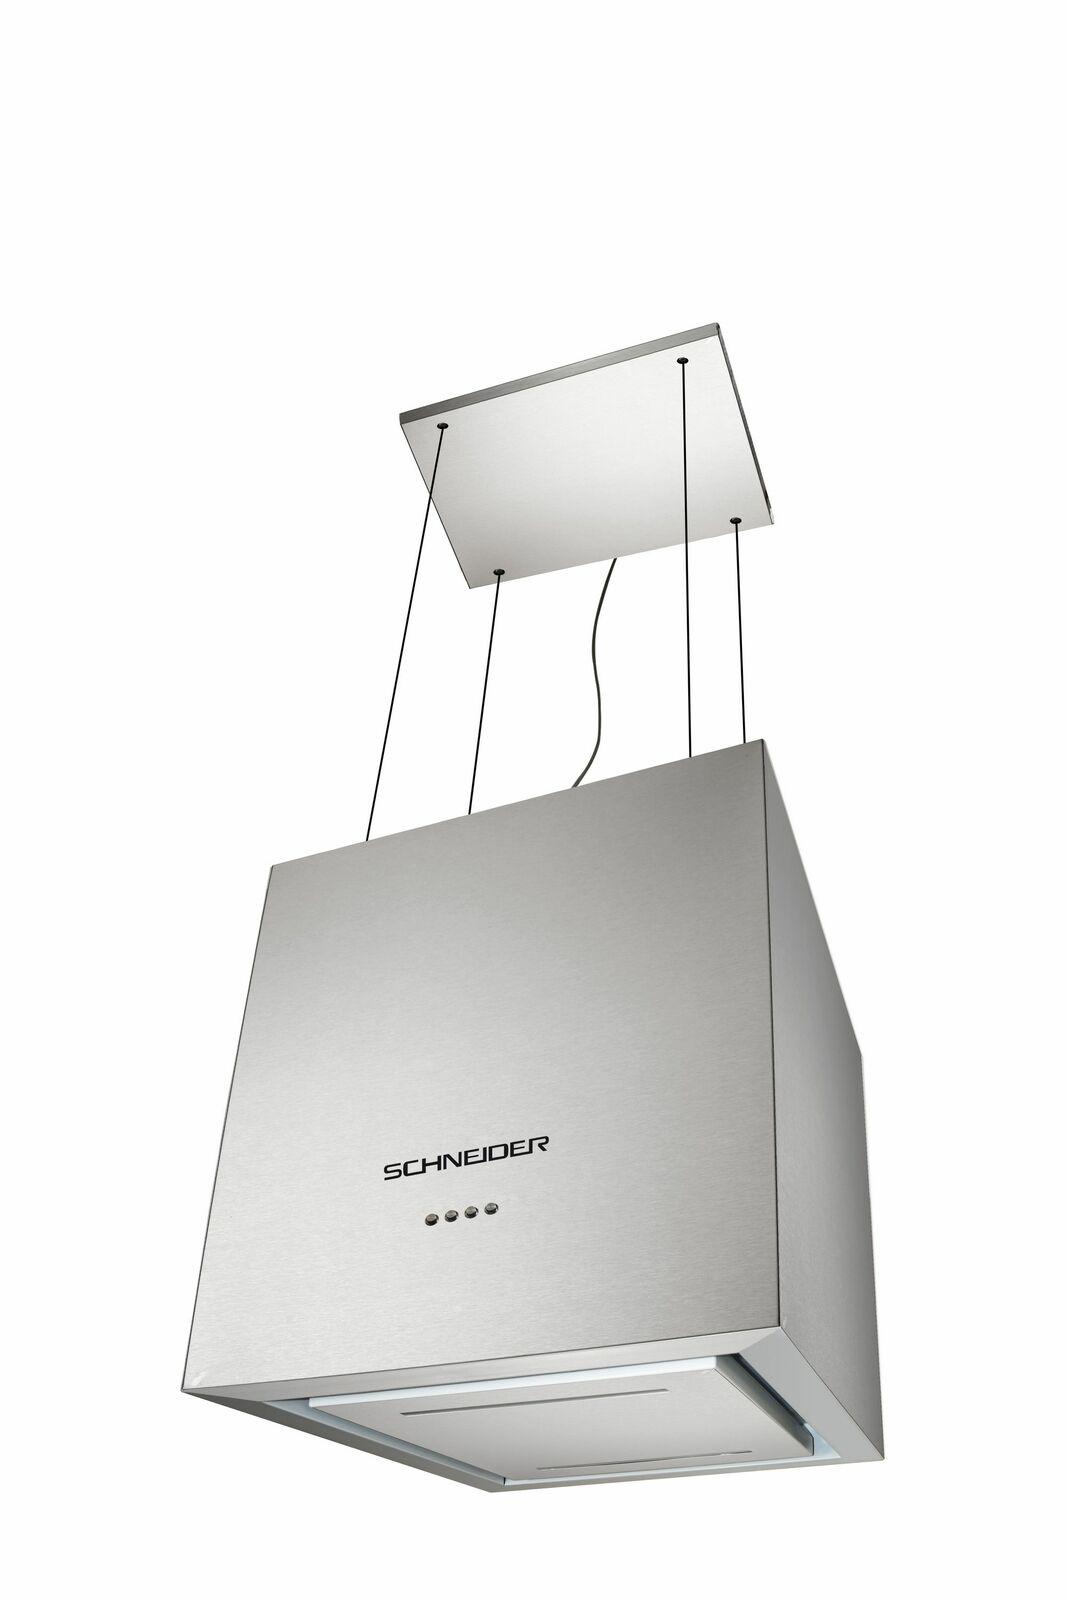 Schneider Inselhaube Dunstabzugshaube A+ Edelstahl hängende 40cm LED Umluft NEU